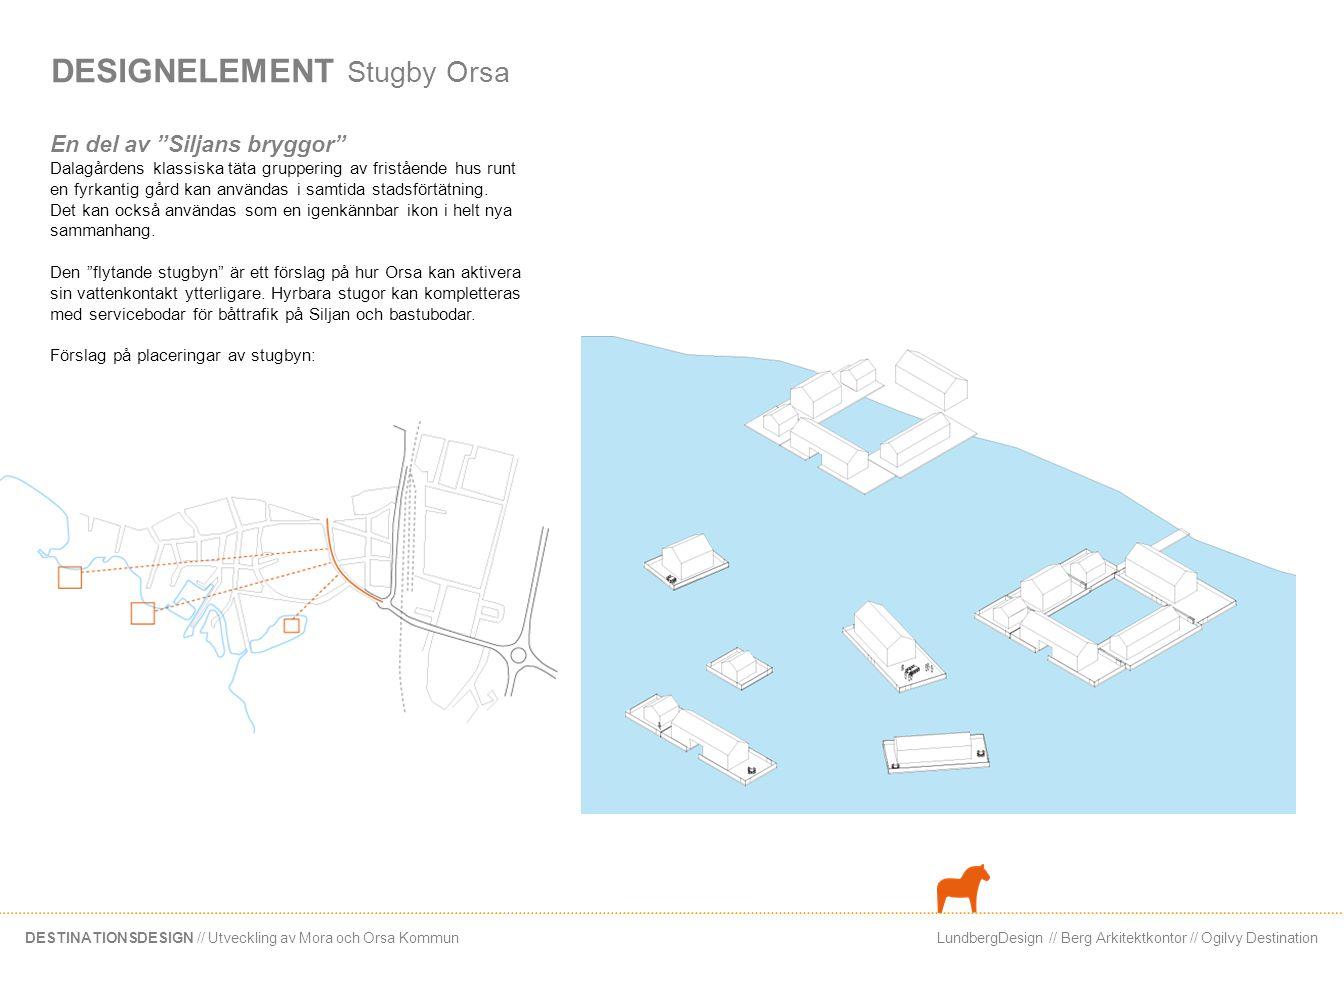 LundbergDesign // Berg Arkitektkontor // Ogilvy DestinationDESTINATIONSDESIGN // Utveckling av Mora och Orsa Kommun DESIGNELEMENT Stugby Orsa En del a